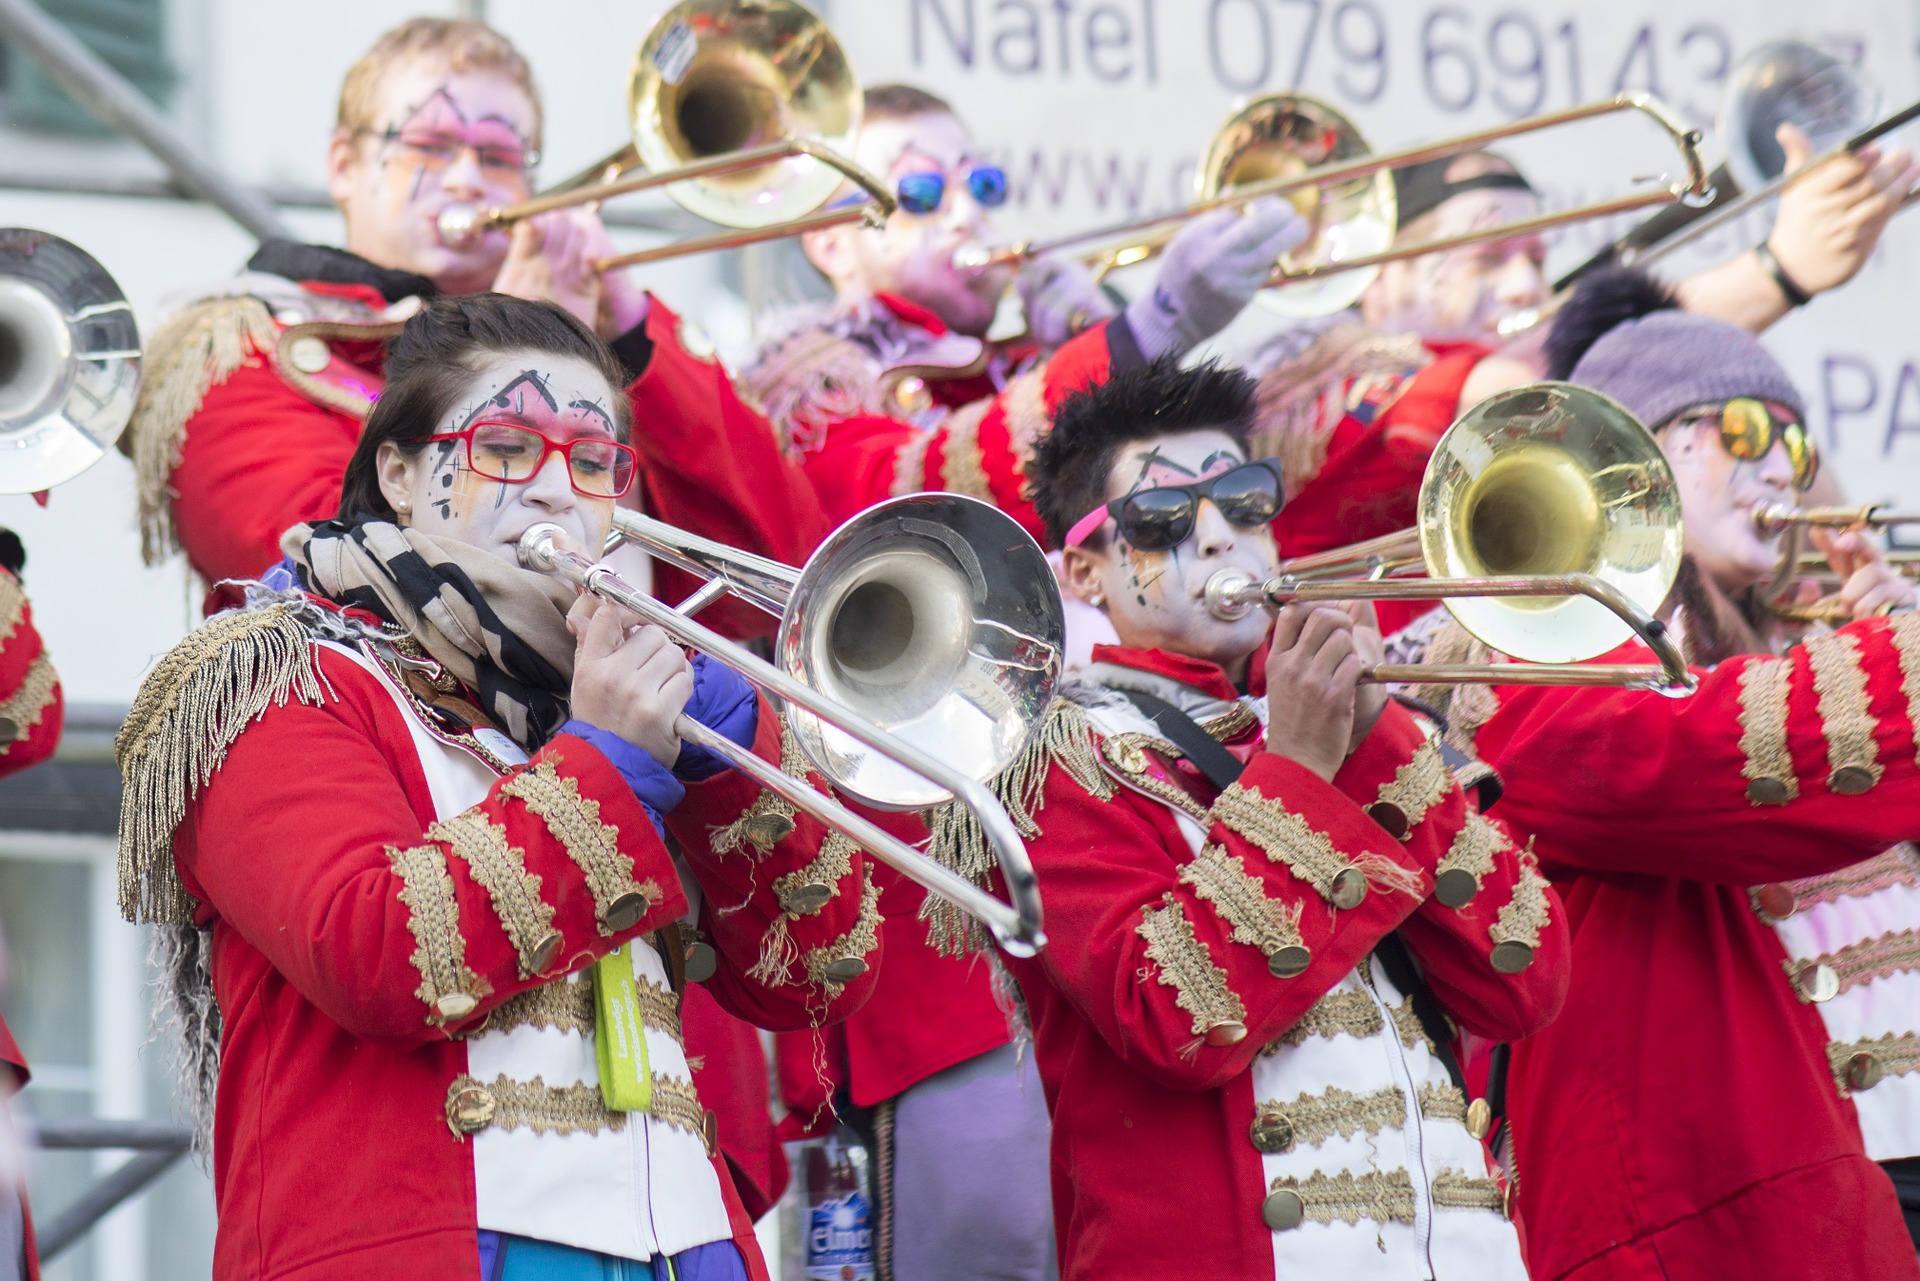 posaune-ehrenfelder-musikschule-köln mann karneval kapelle